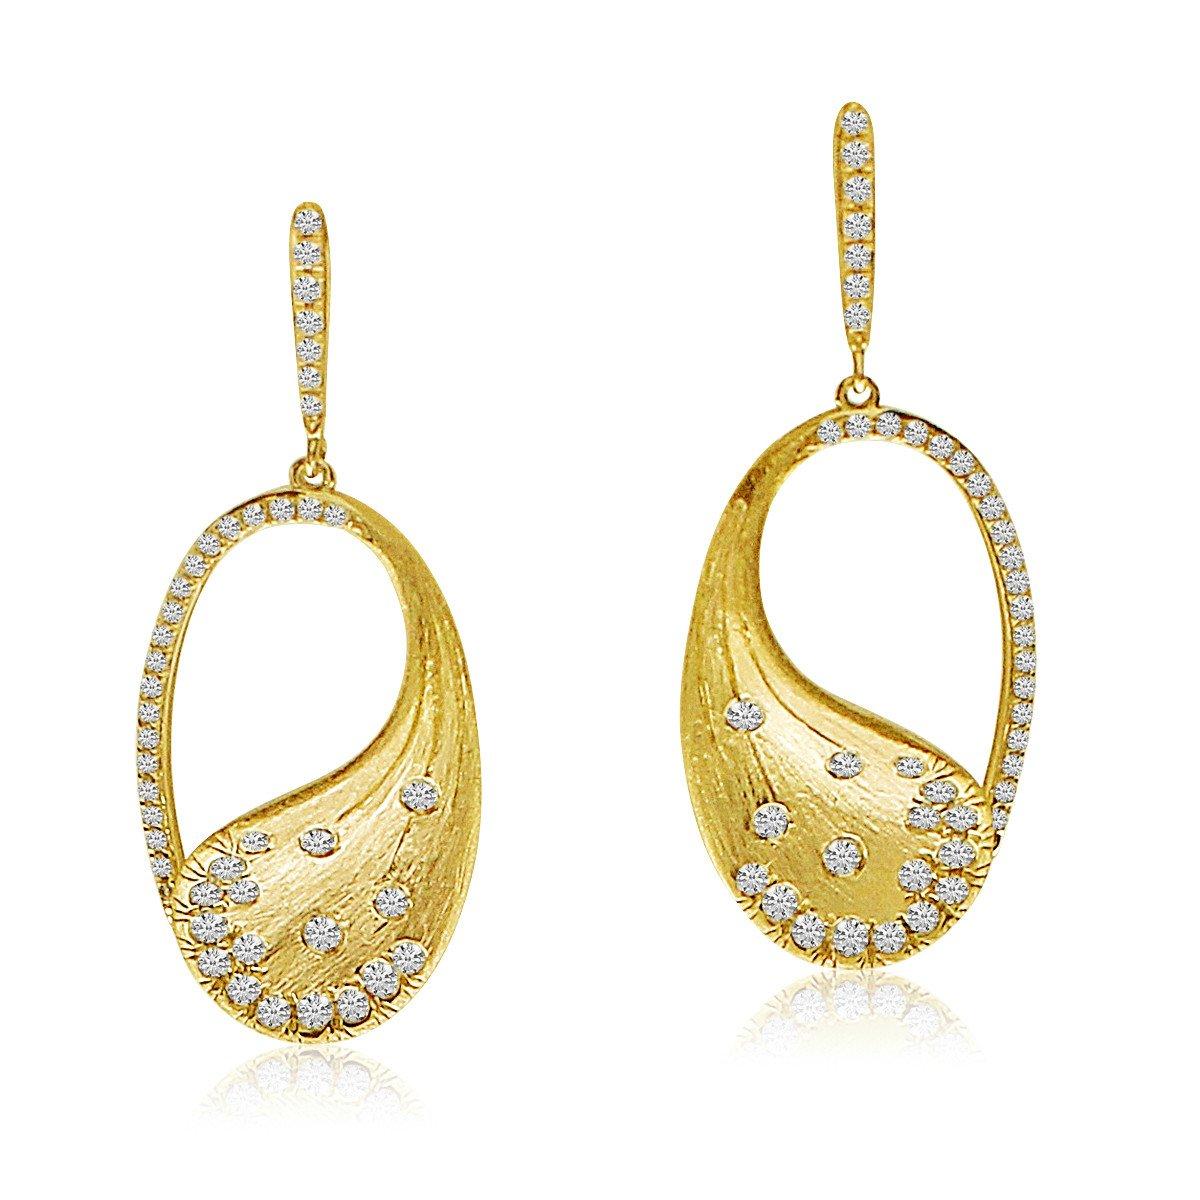 14K Yellow Brushed Gold Oval Diamond Fashion Earrings